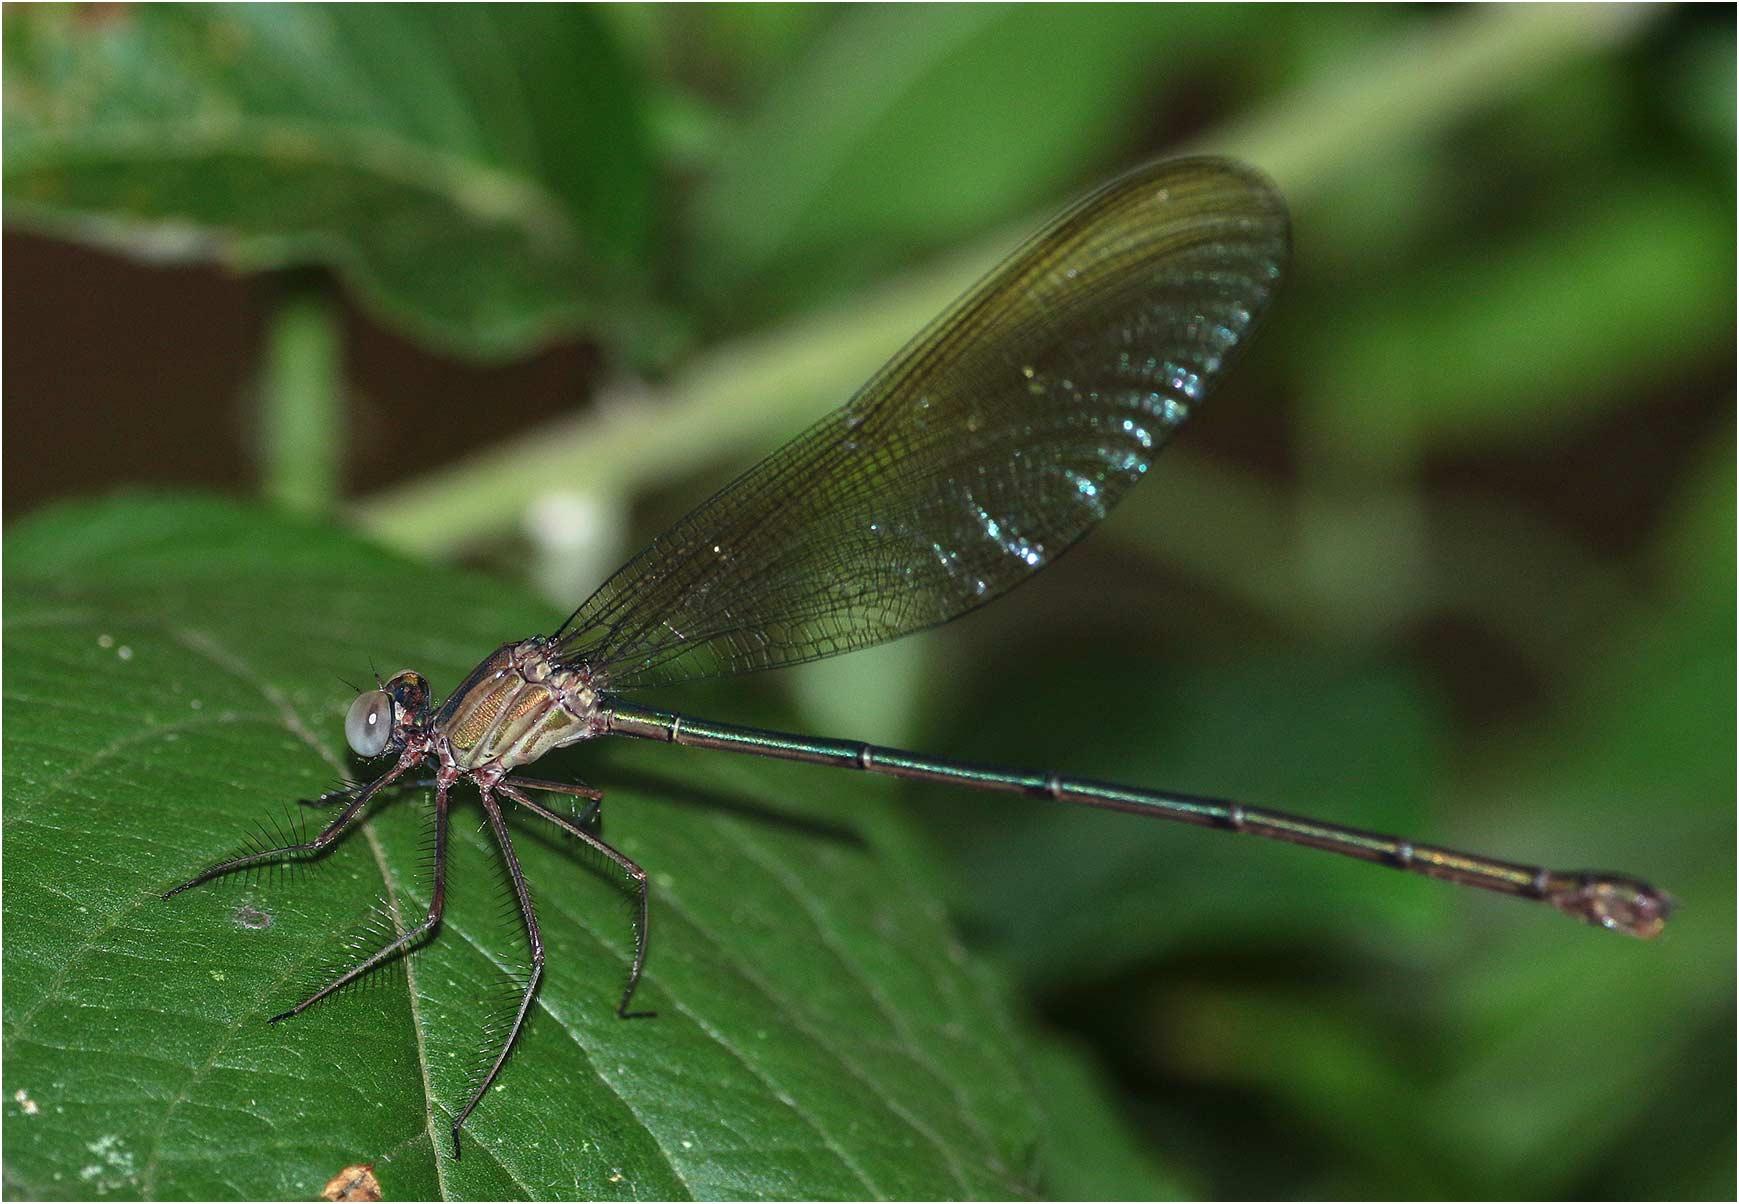 Phaon iridipennis femelle, Namibie, Popa Fall (Okavango), 18/02/2020